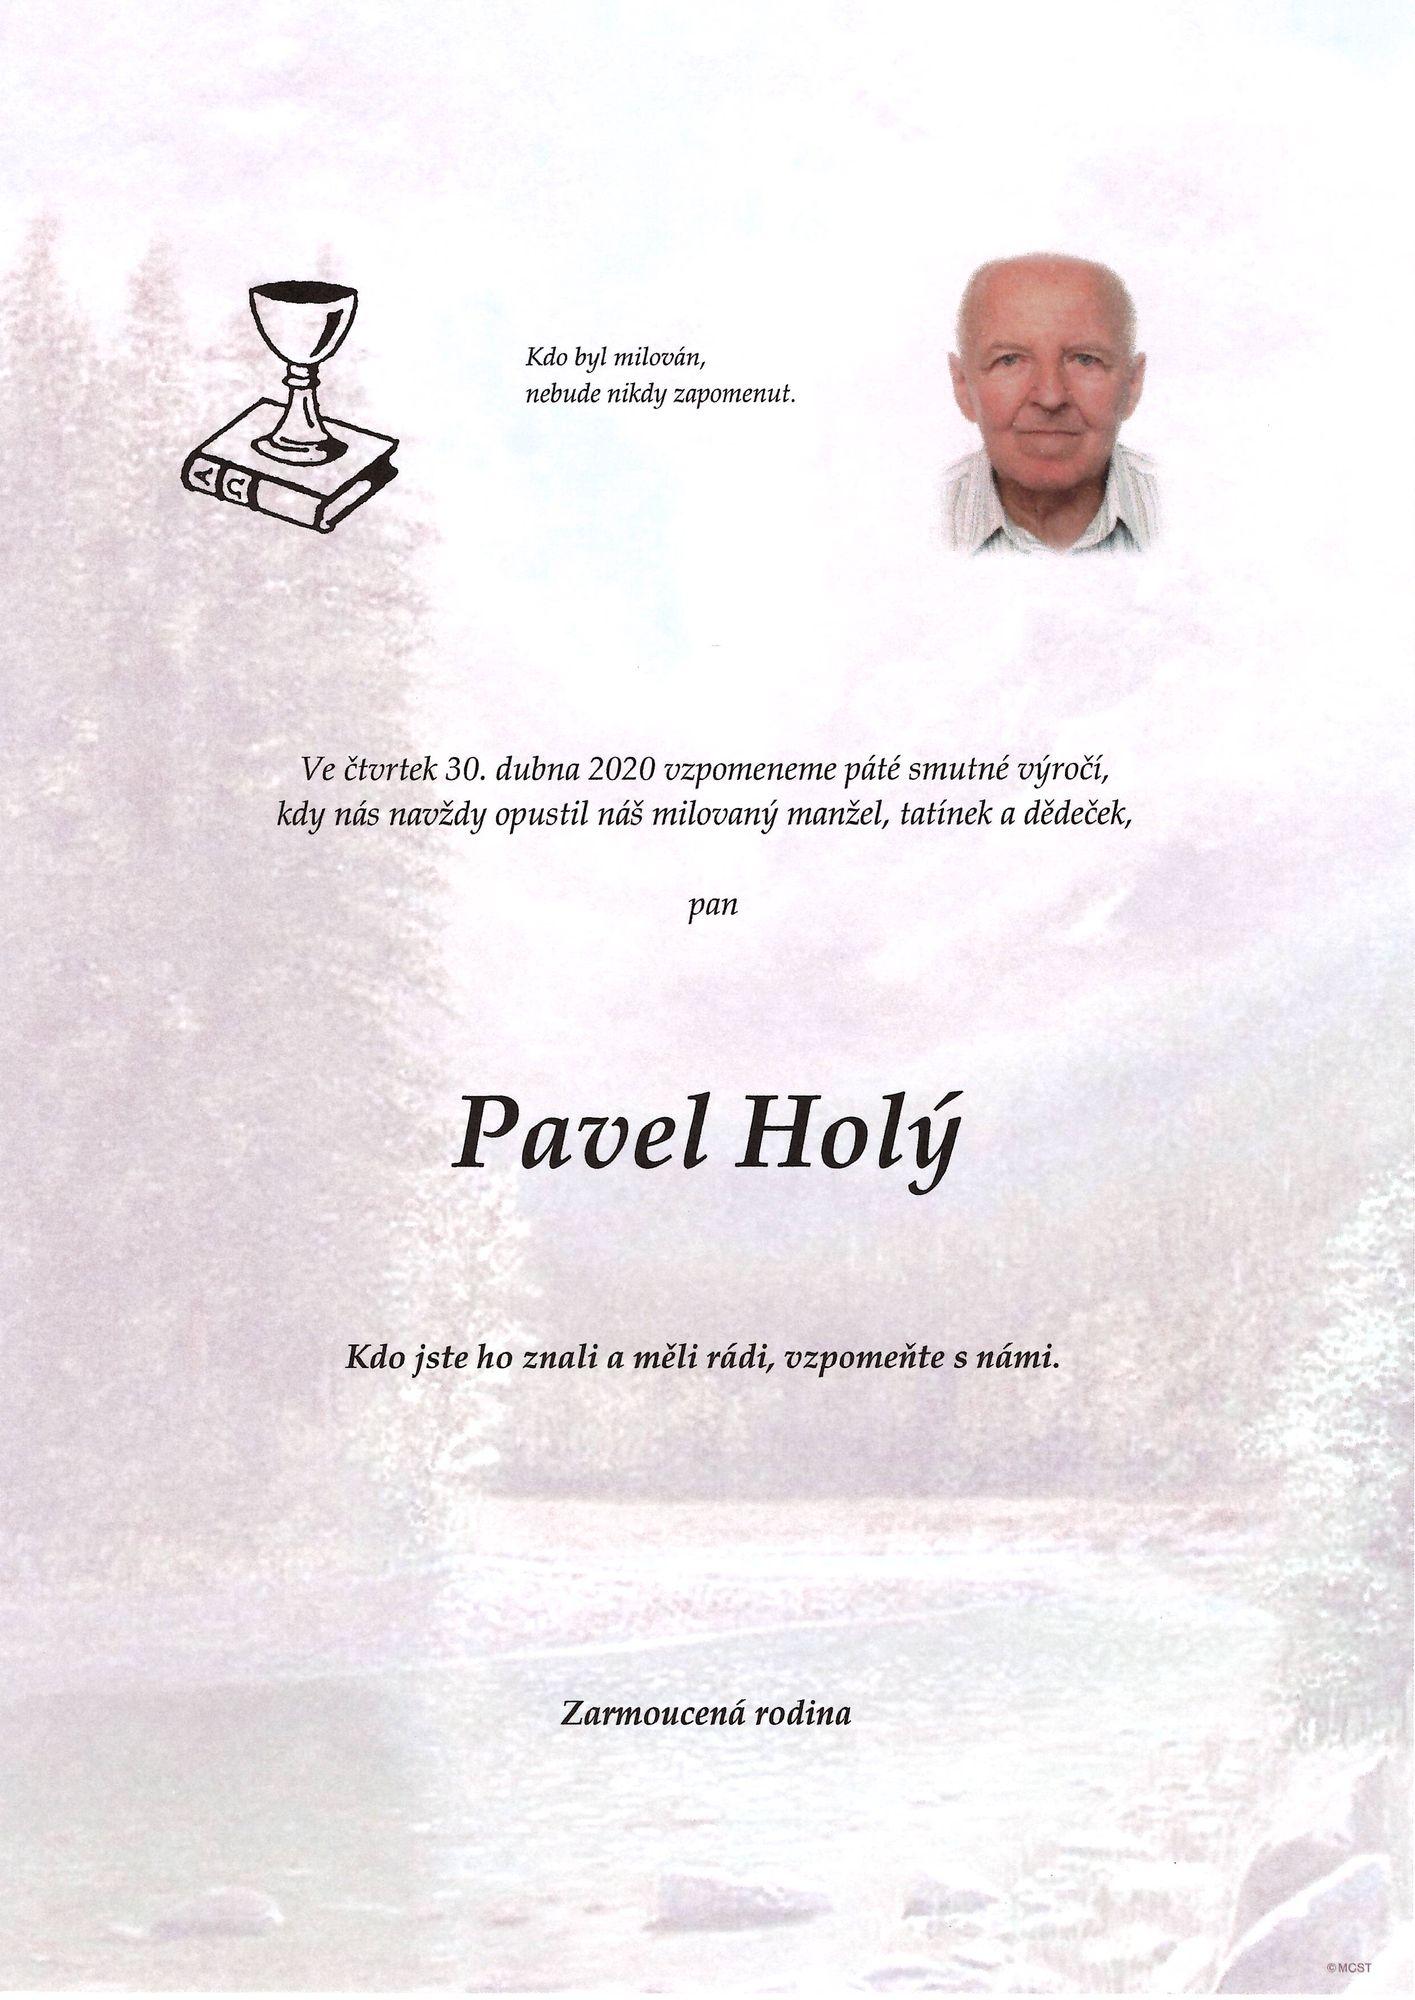 Pavel Holý